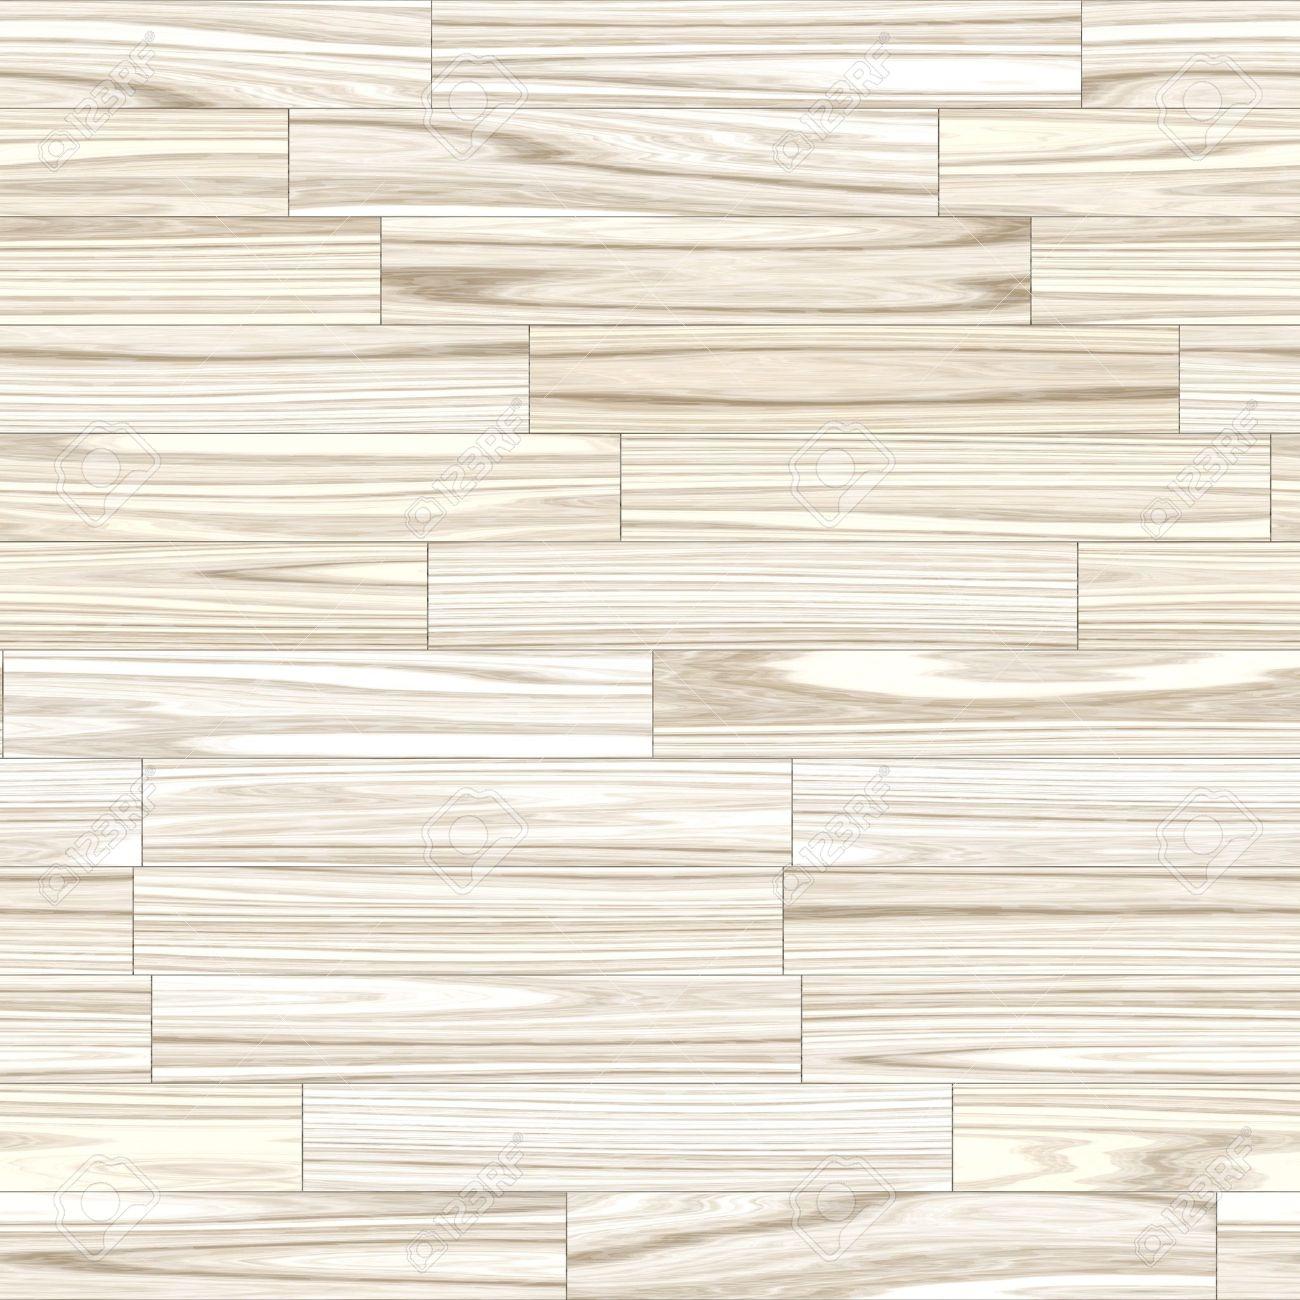 Light Colored Wood